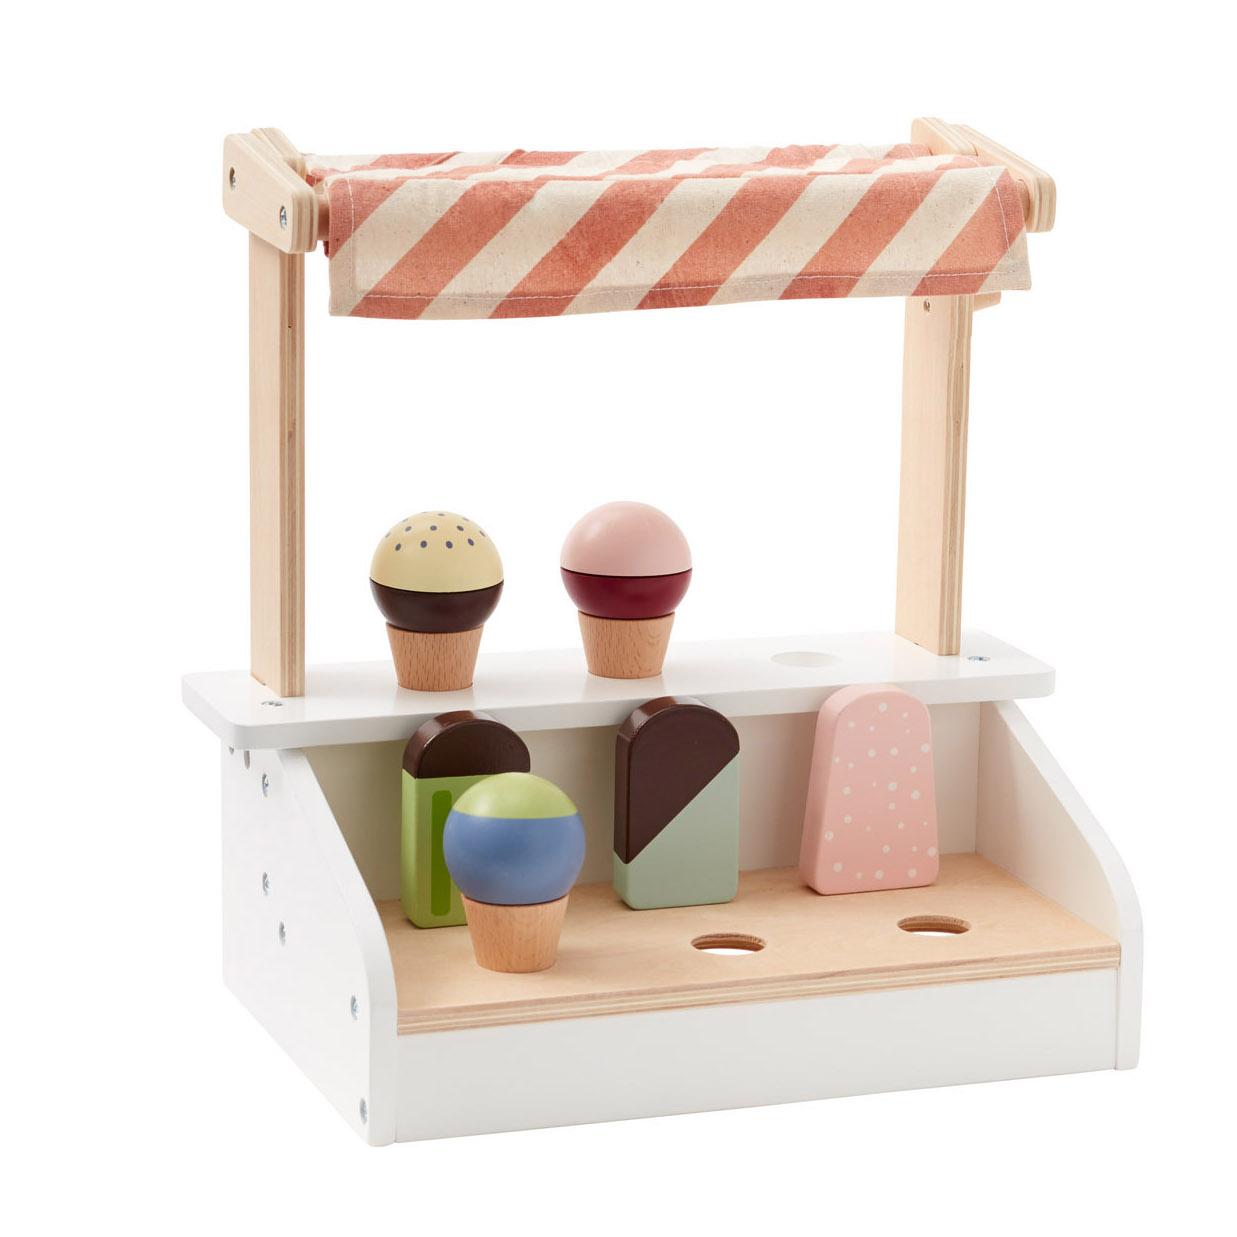 kids concept //木製おもちゃのアイスクリームスタンド